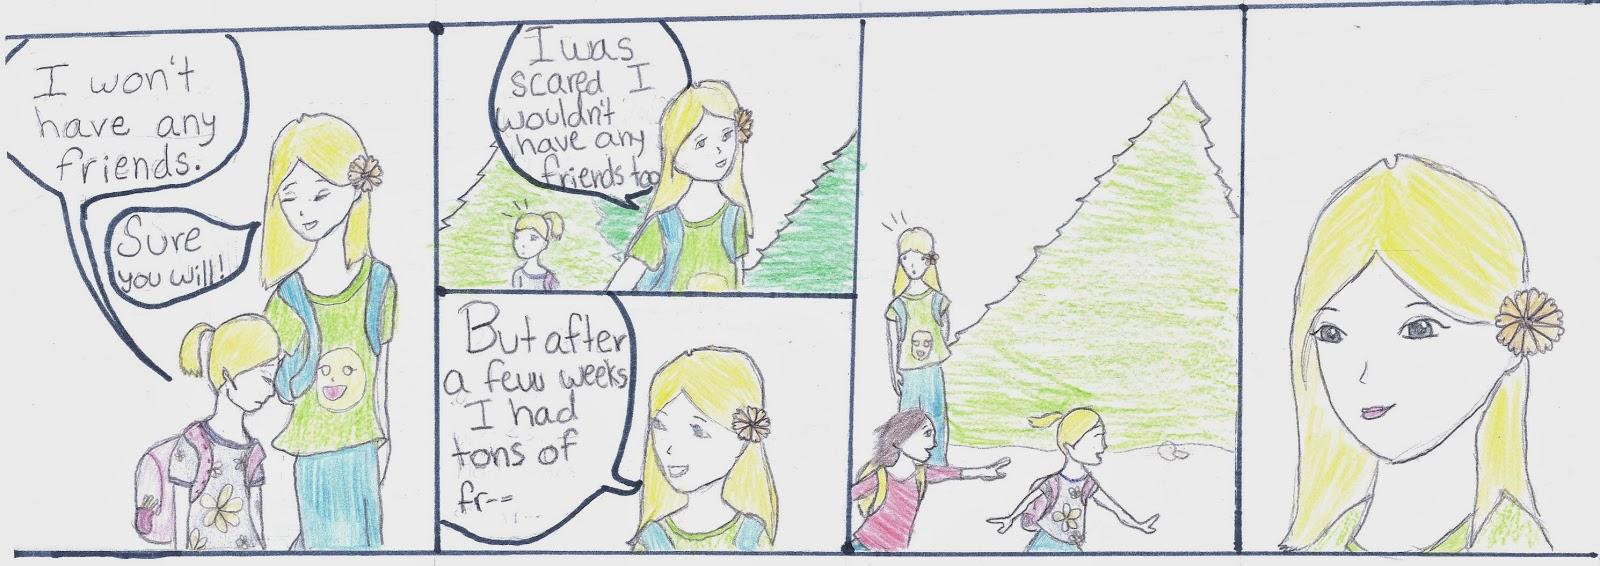 Back+to+School+Comic+by+Savannah+Leavitt.jpg